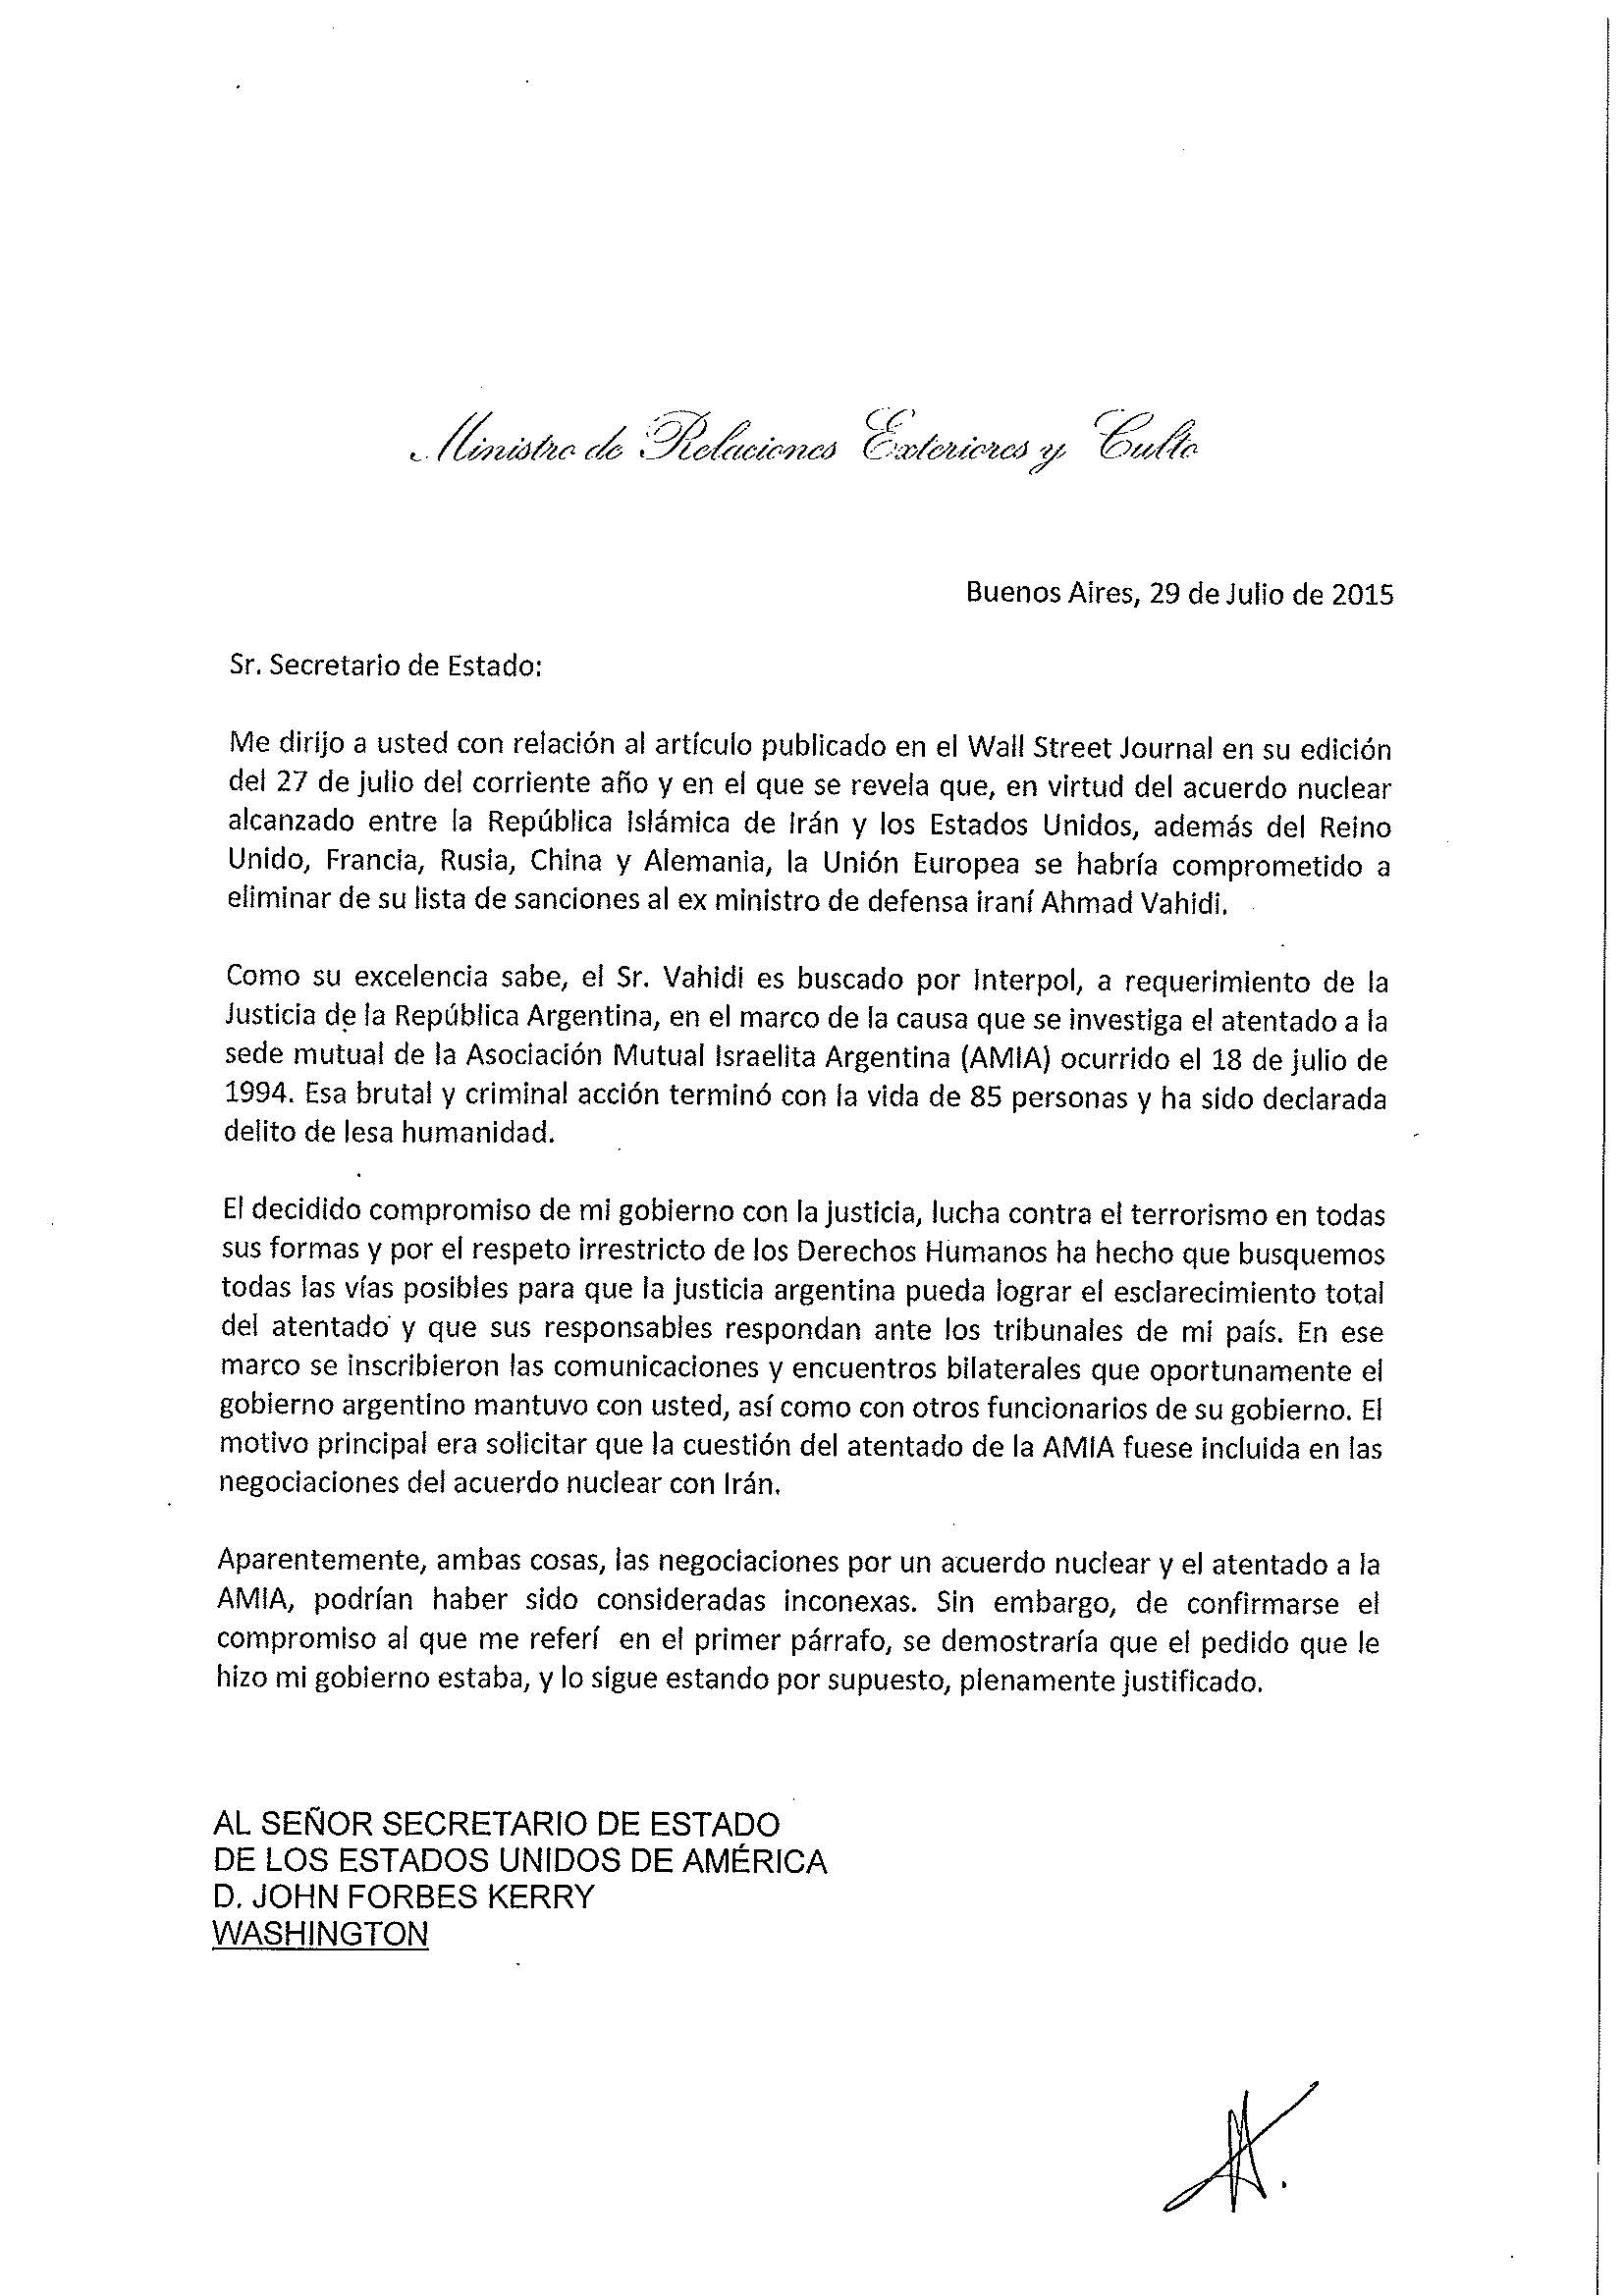 nota a Kerry en español_Page_1